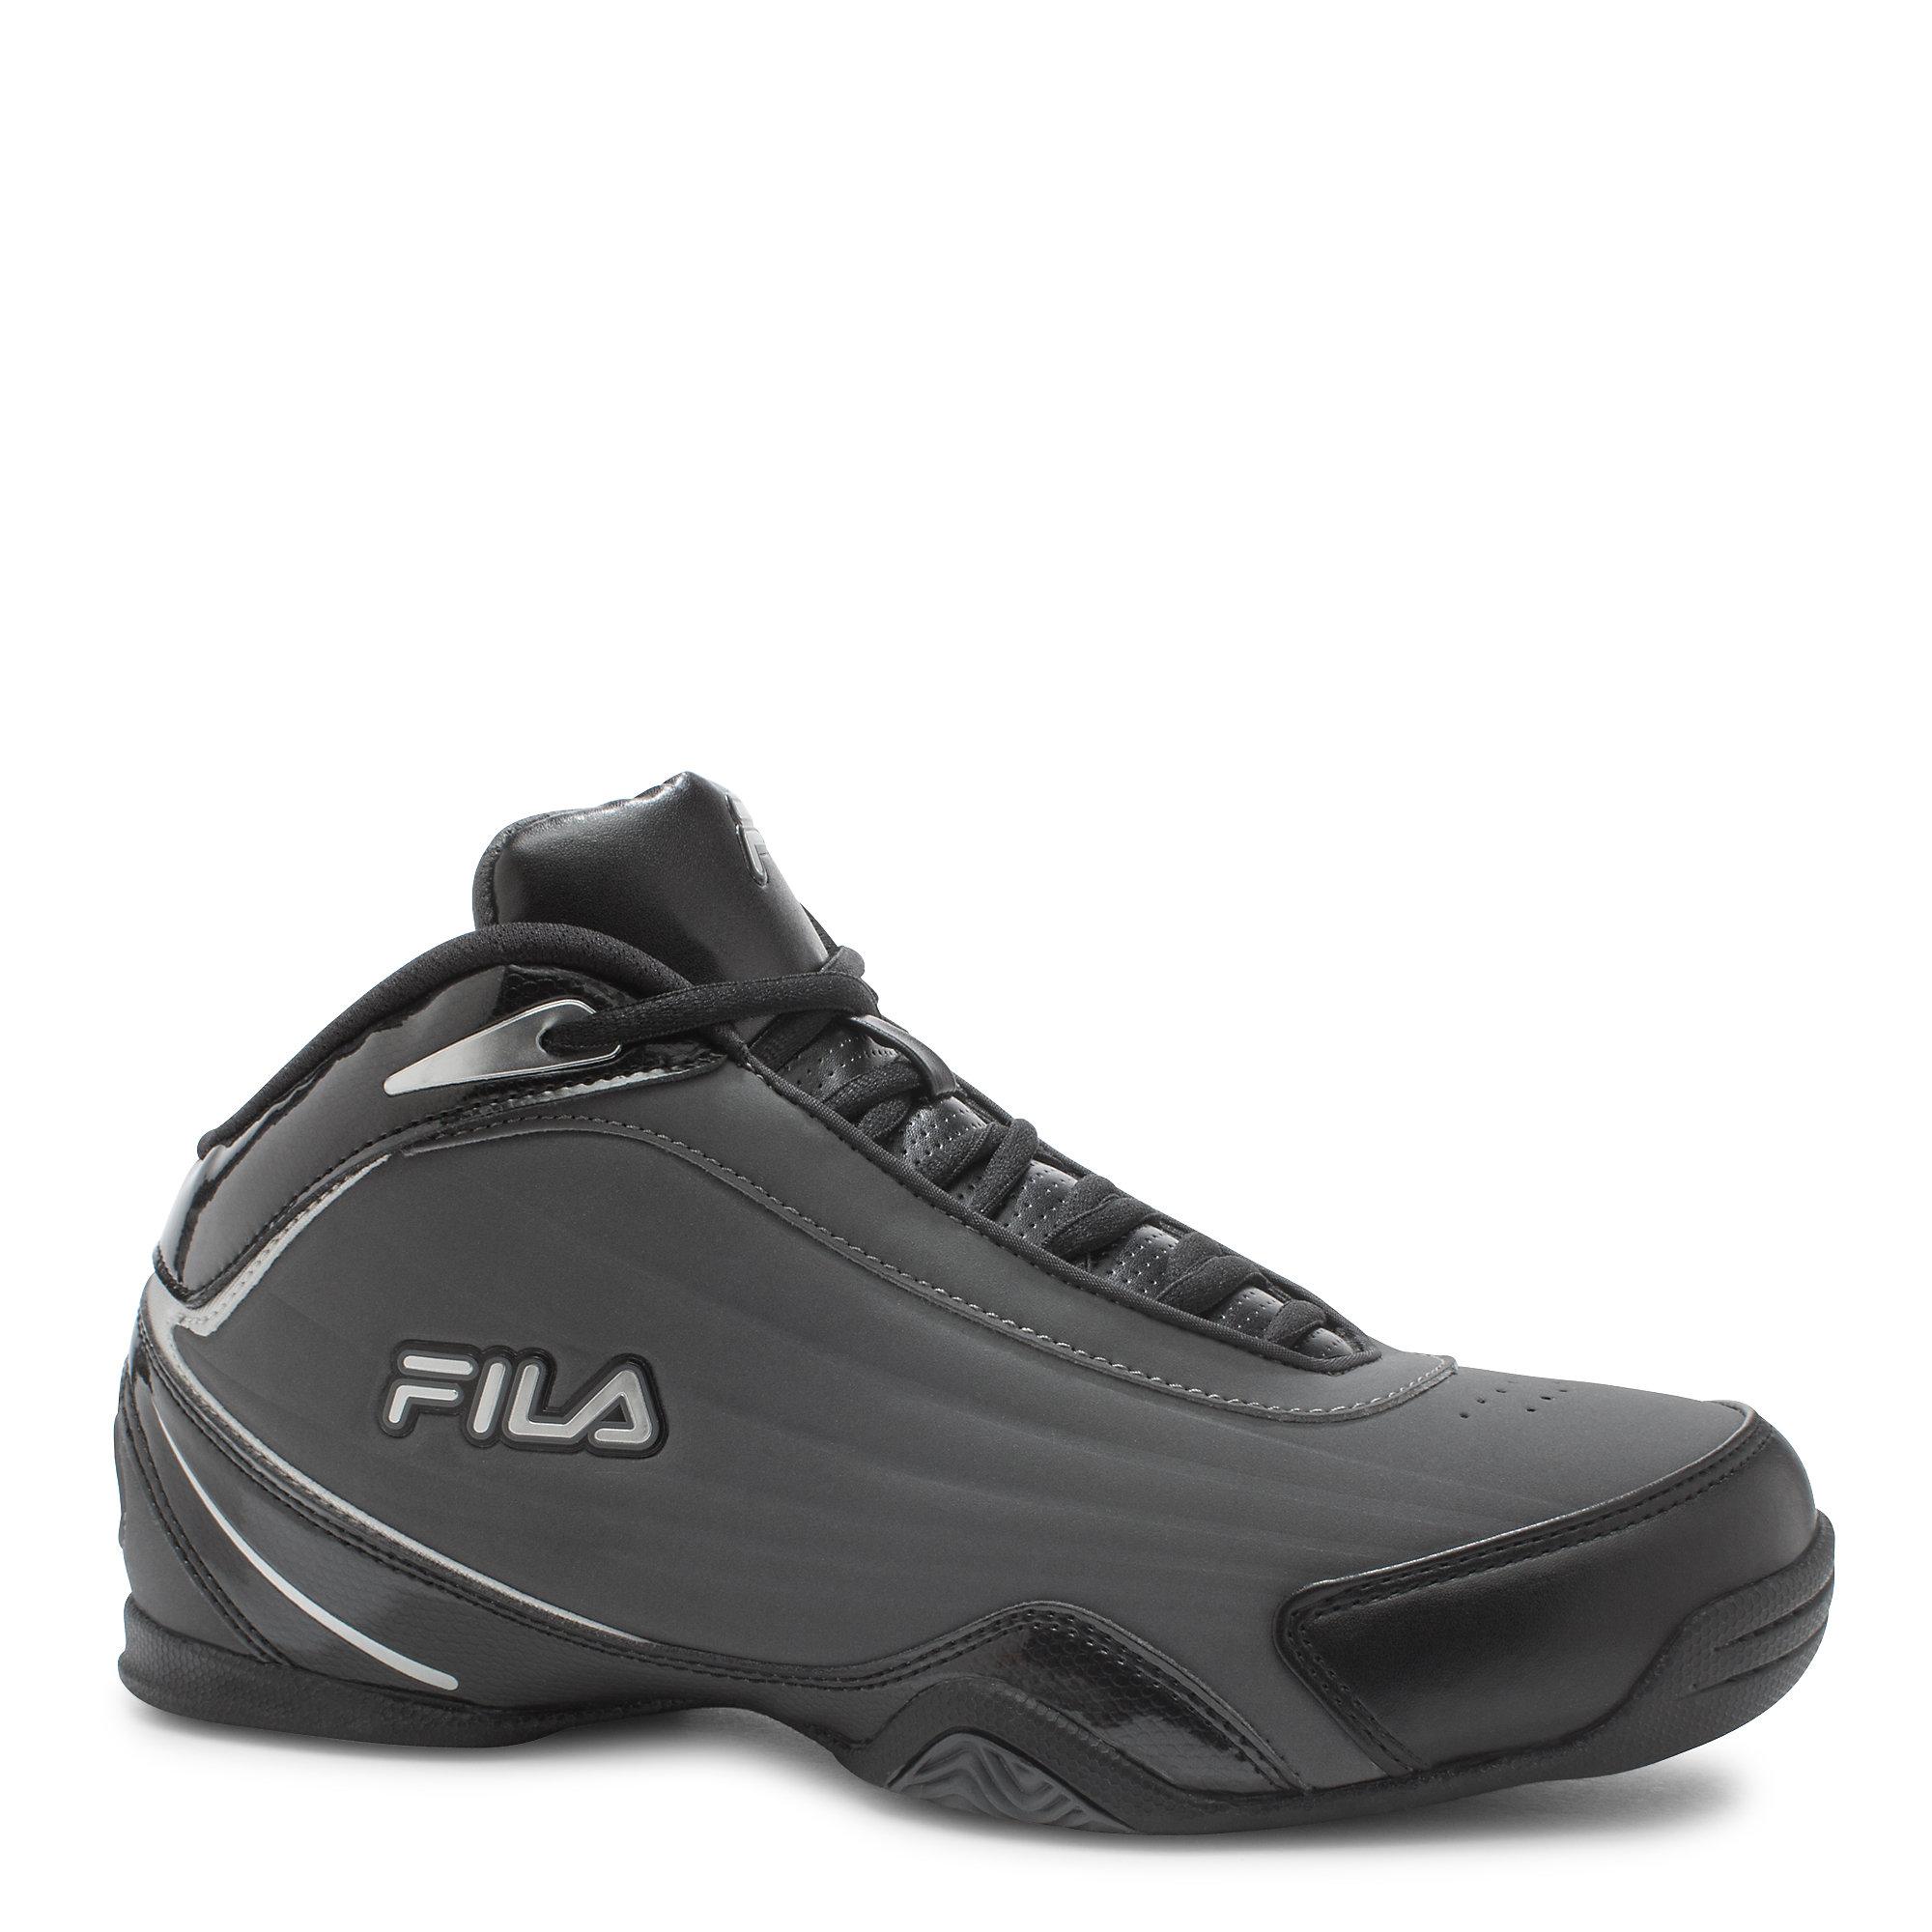 fila men 39 s filabuck slam 12c basketball sneakers ebay. Black Bedroom Furniture Sets. Home Design Ideas